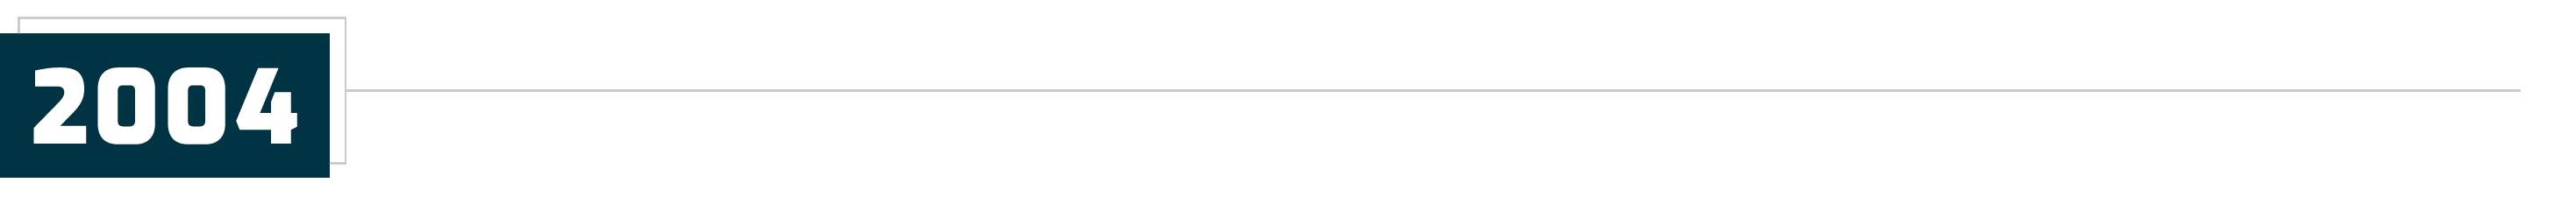 Choice Bank Timeline 2004